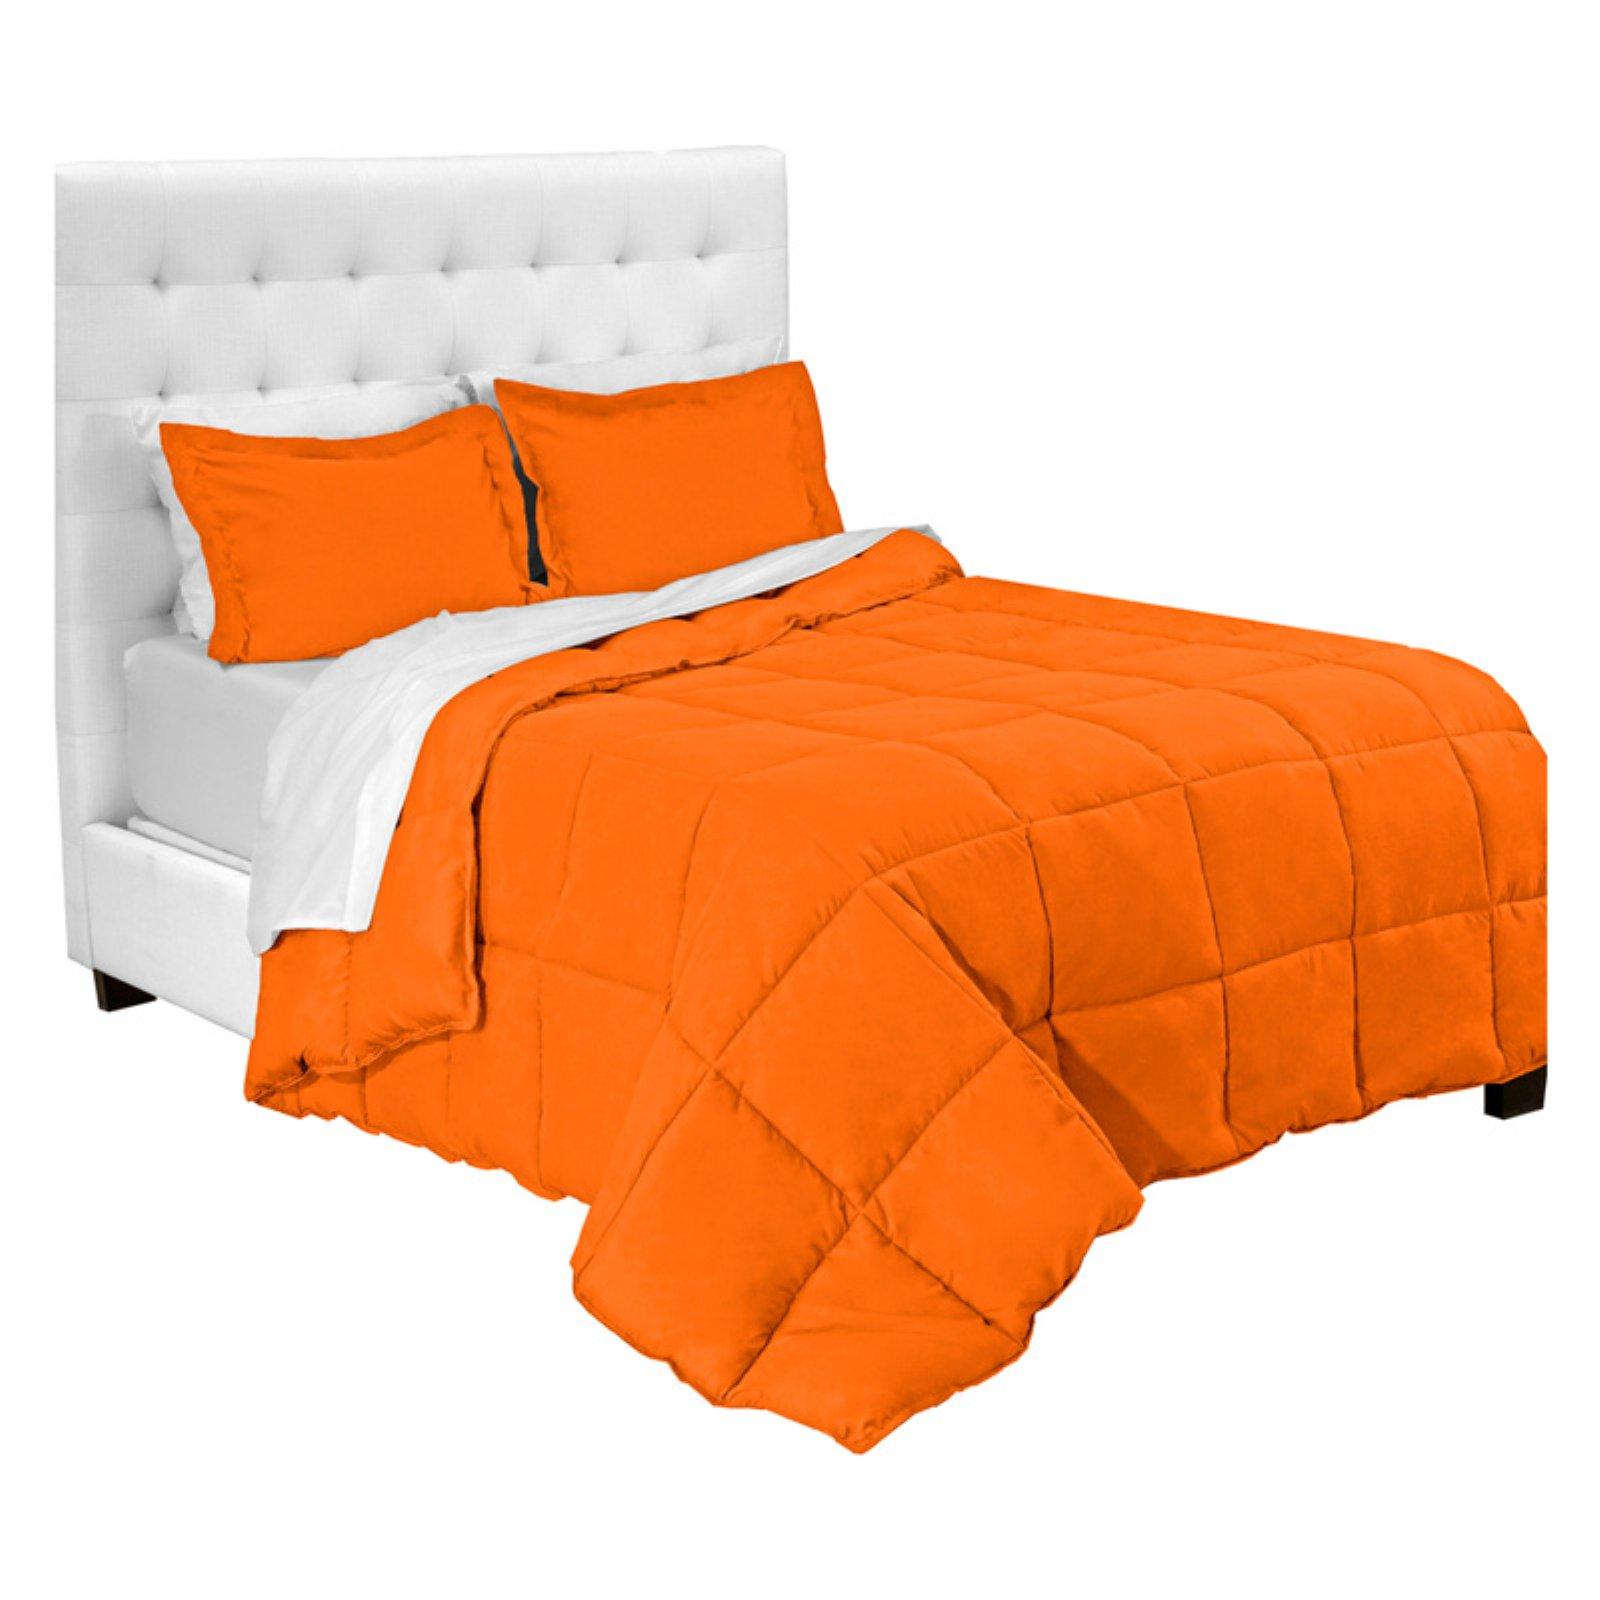 Premium 1800 Series Microfiber Bed In A Bag By Bare Home Orange